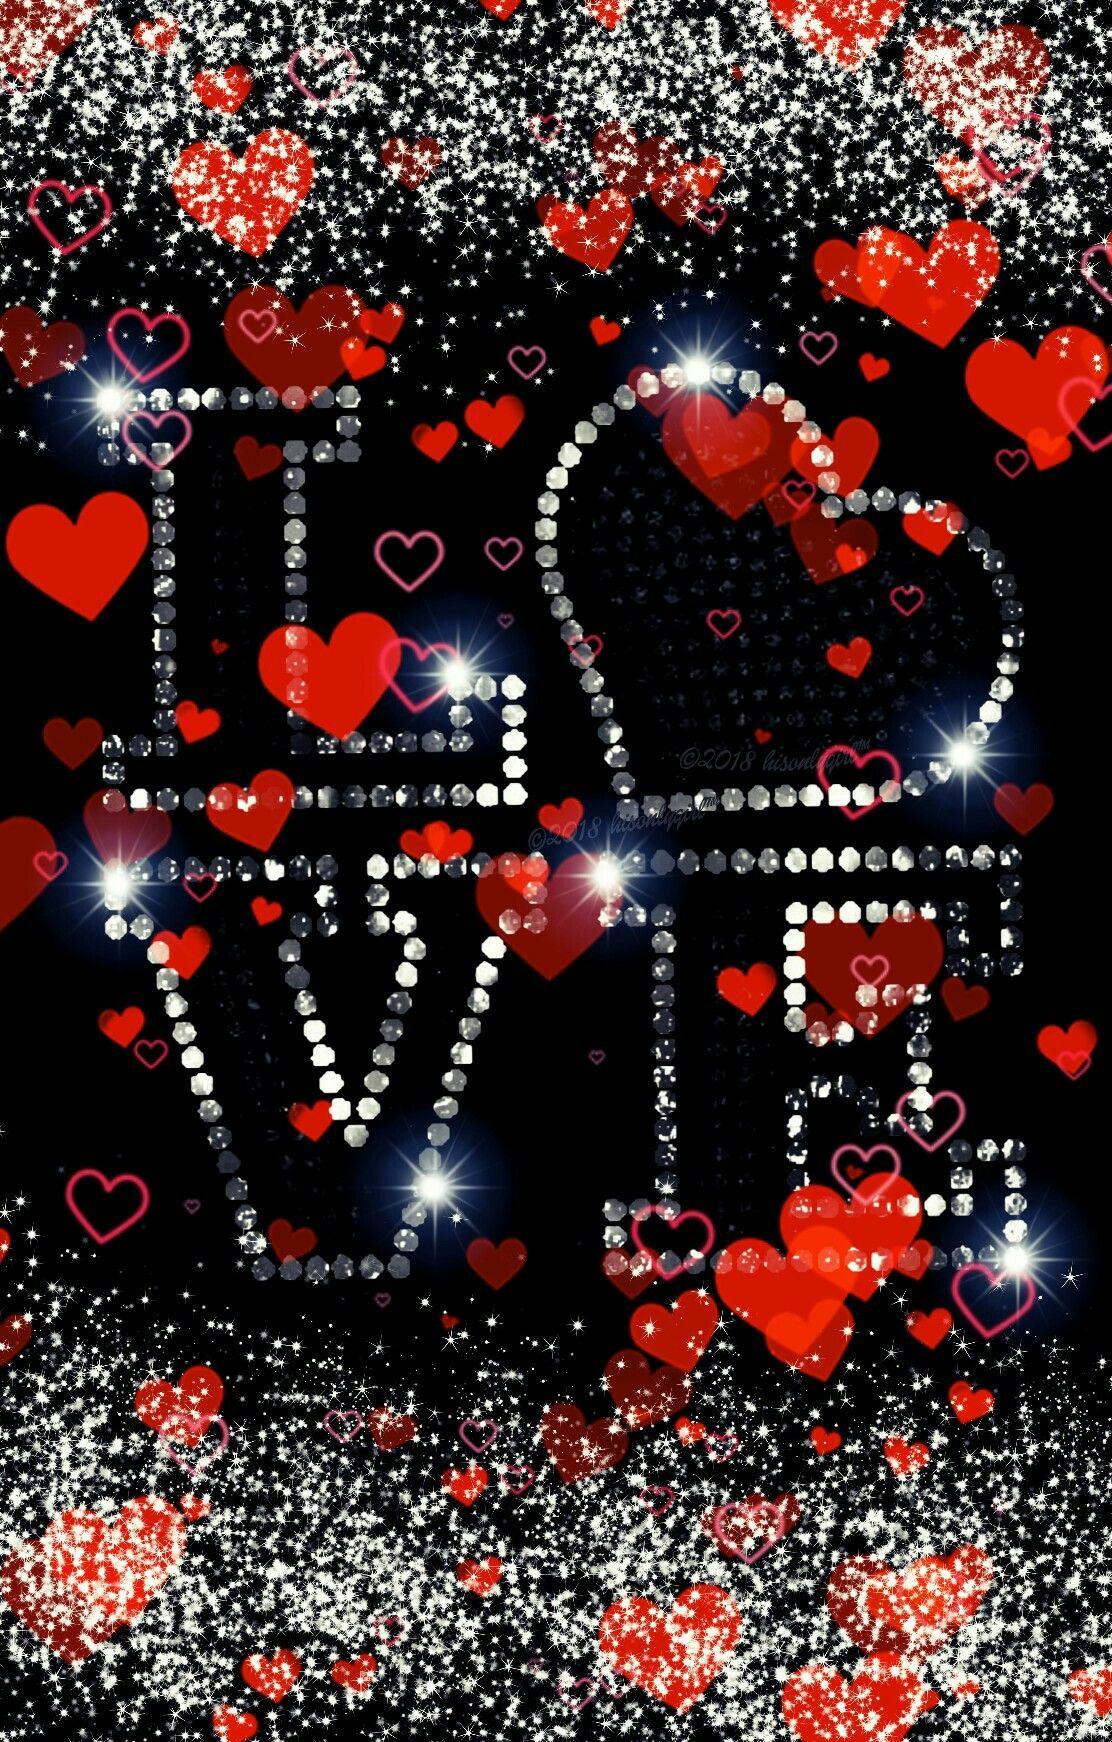 Red Hearts Love Glitter Wallpaper I Created For Cocoppa Heart Wallpaper Love Wallpapers Romantic Love Wallpaper